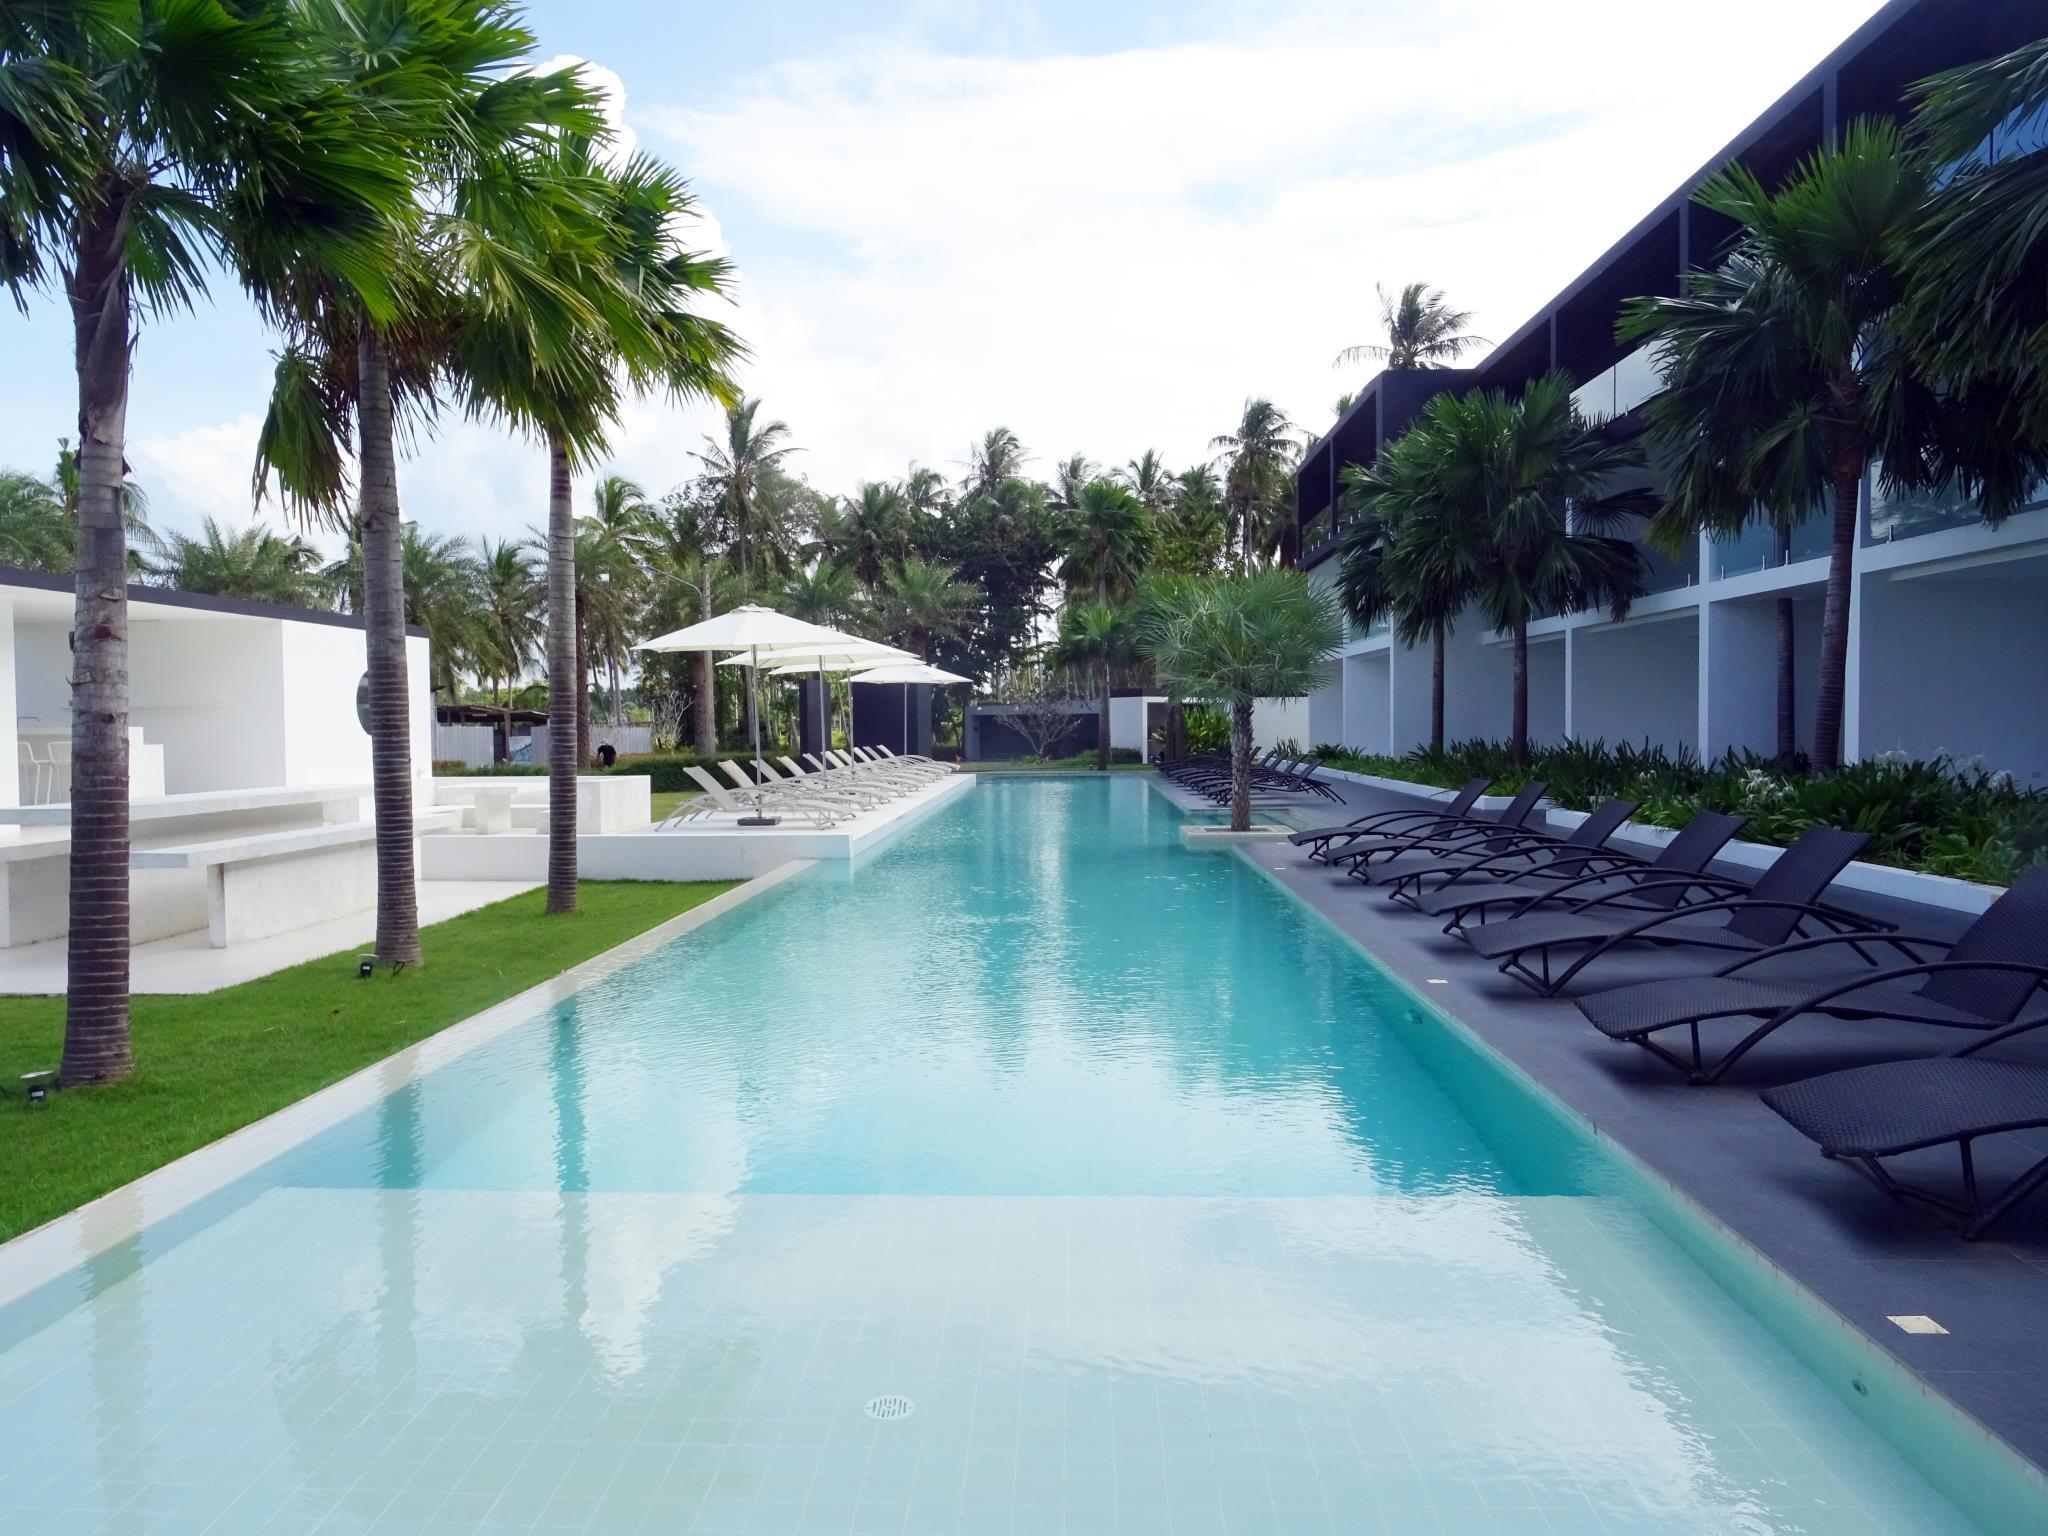 Livinghouse Thailand Condominium,ลิฟวิ่งเฮาส์ ไทยแลนด์ คอนโดมิเนียม